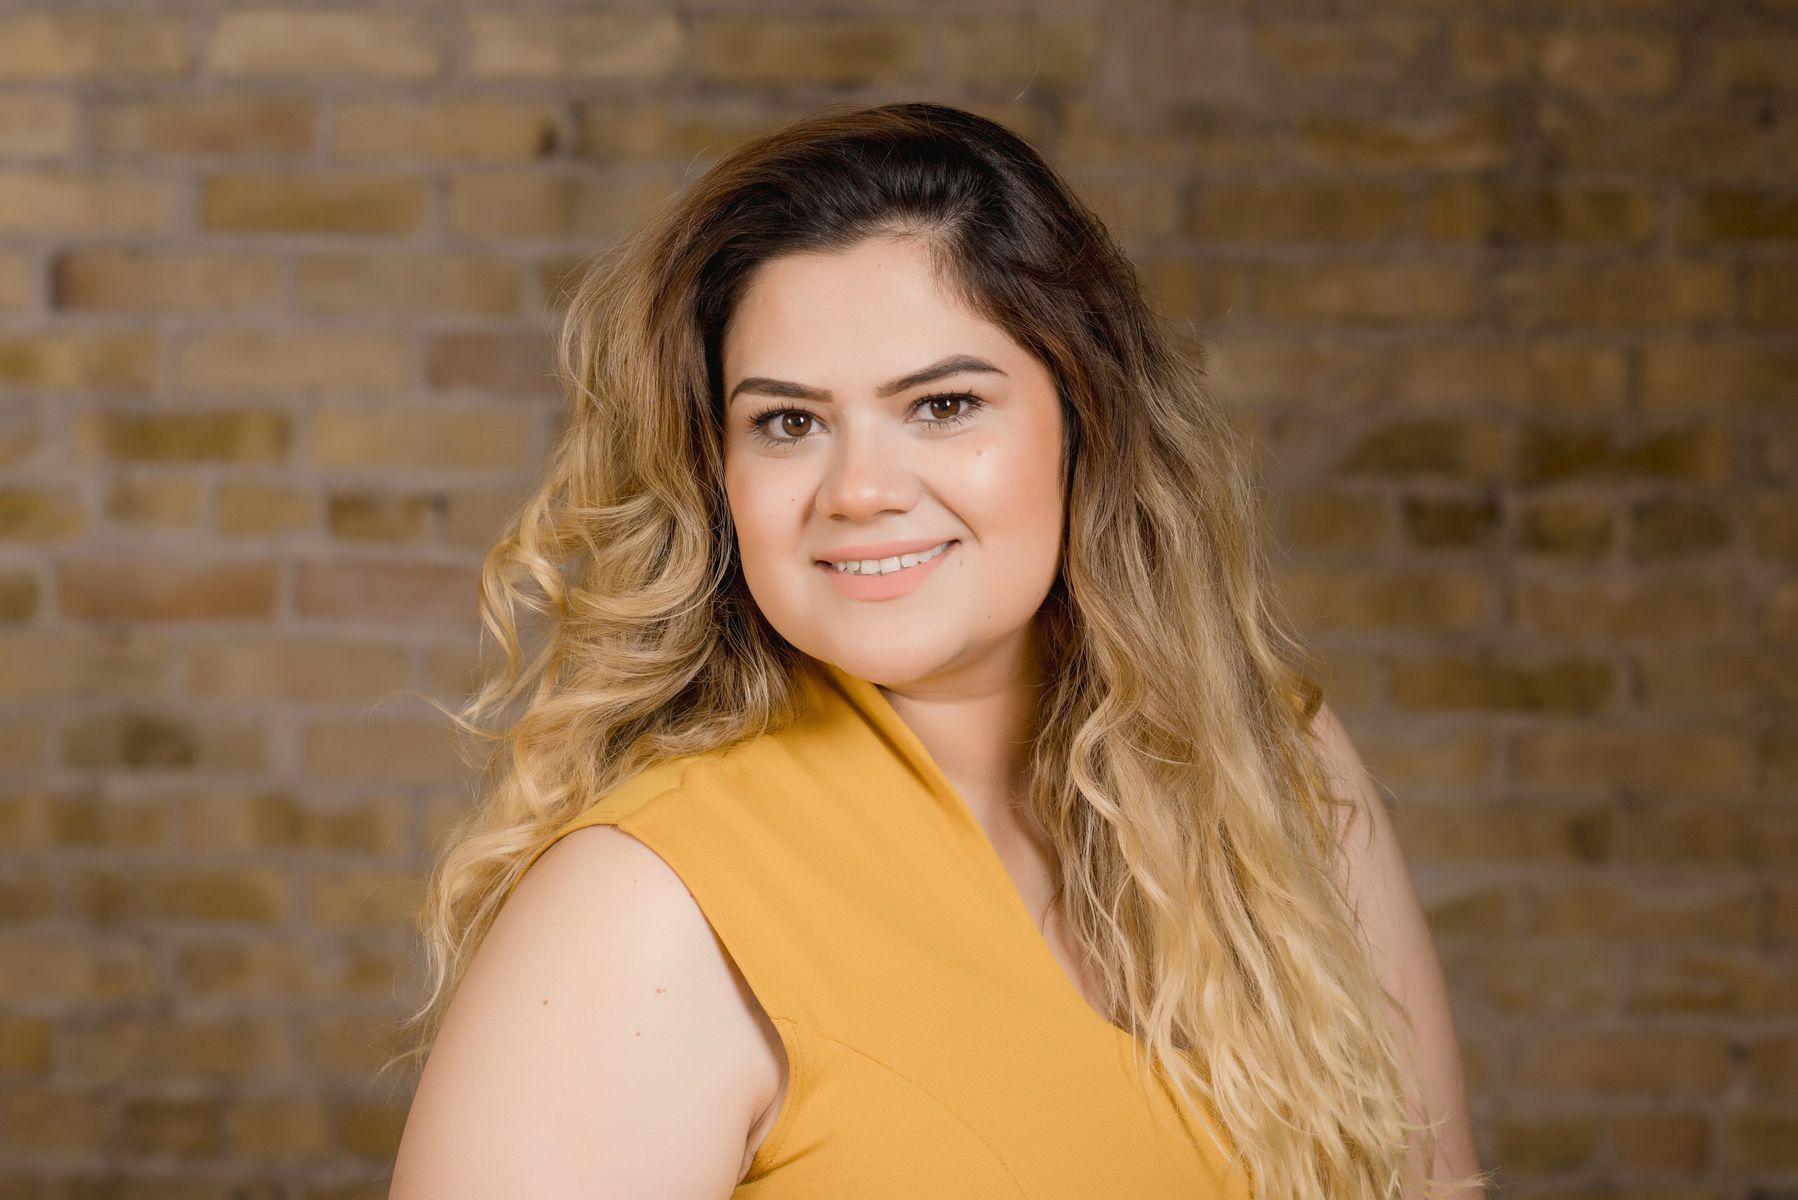 Tania Sanchez